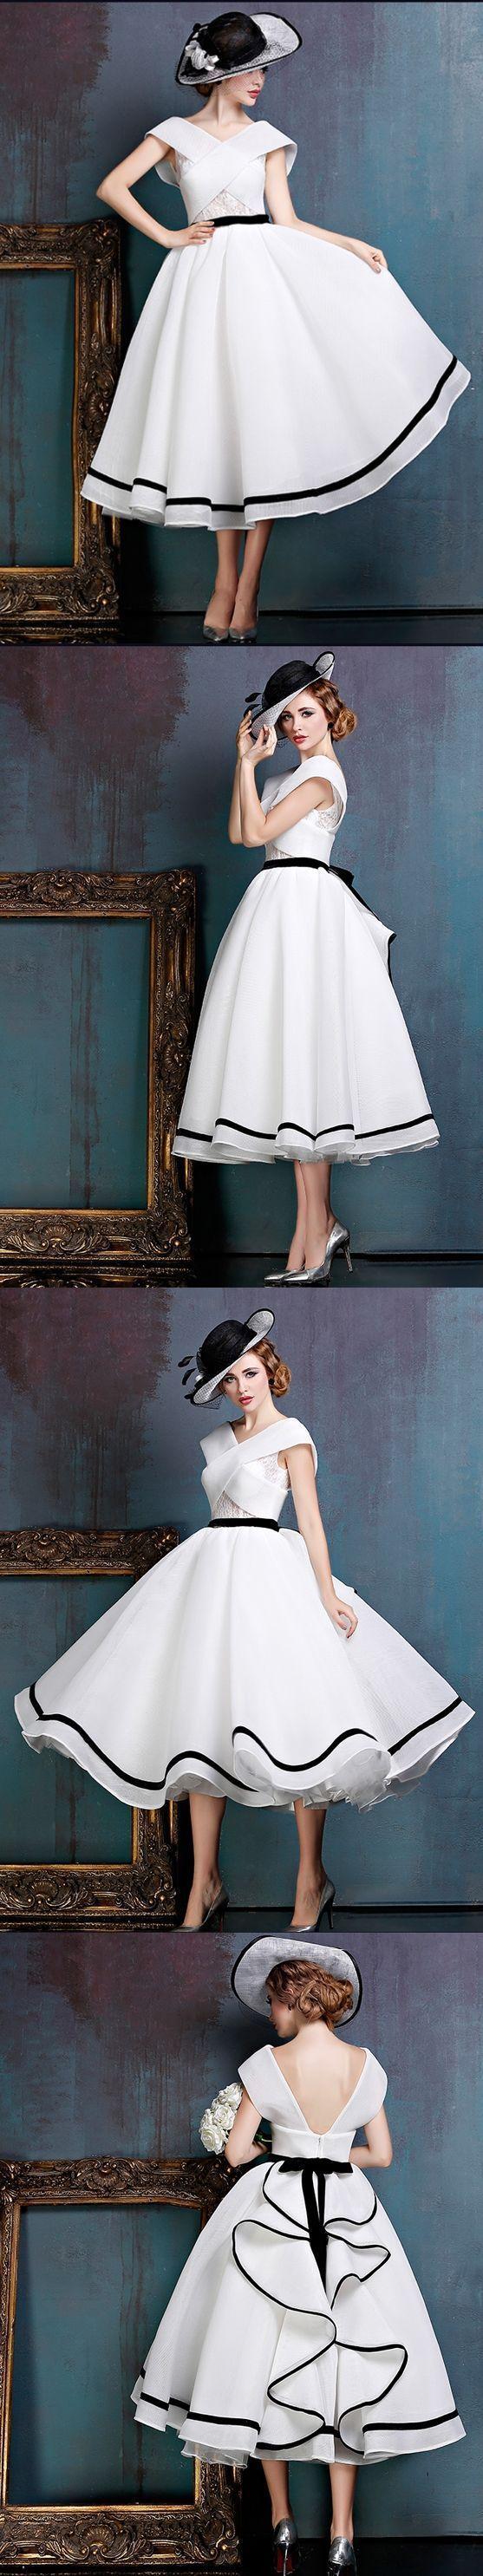 Photo of #Dress #Homecoming #Kleid #Kurze #Lace #Vintage